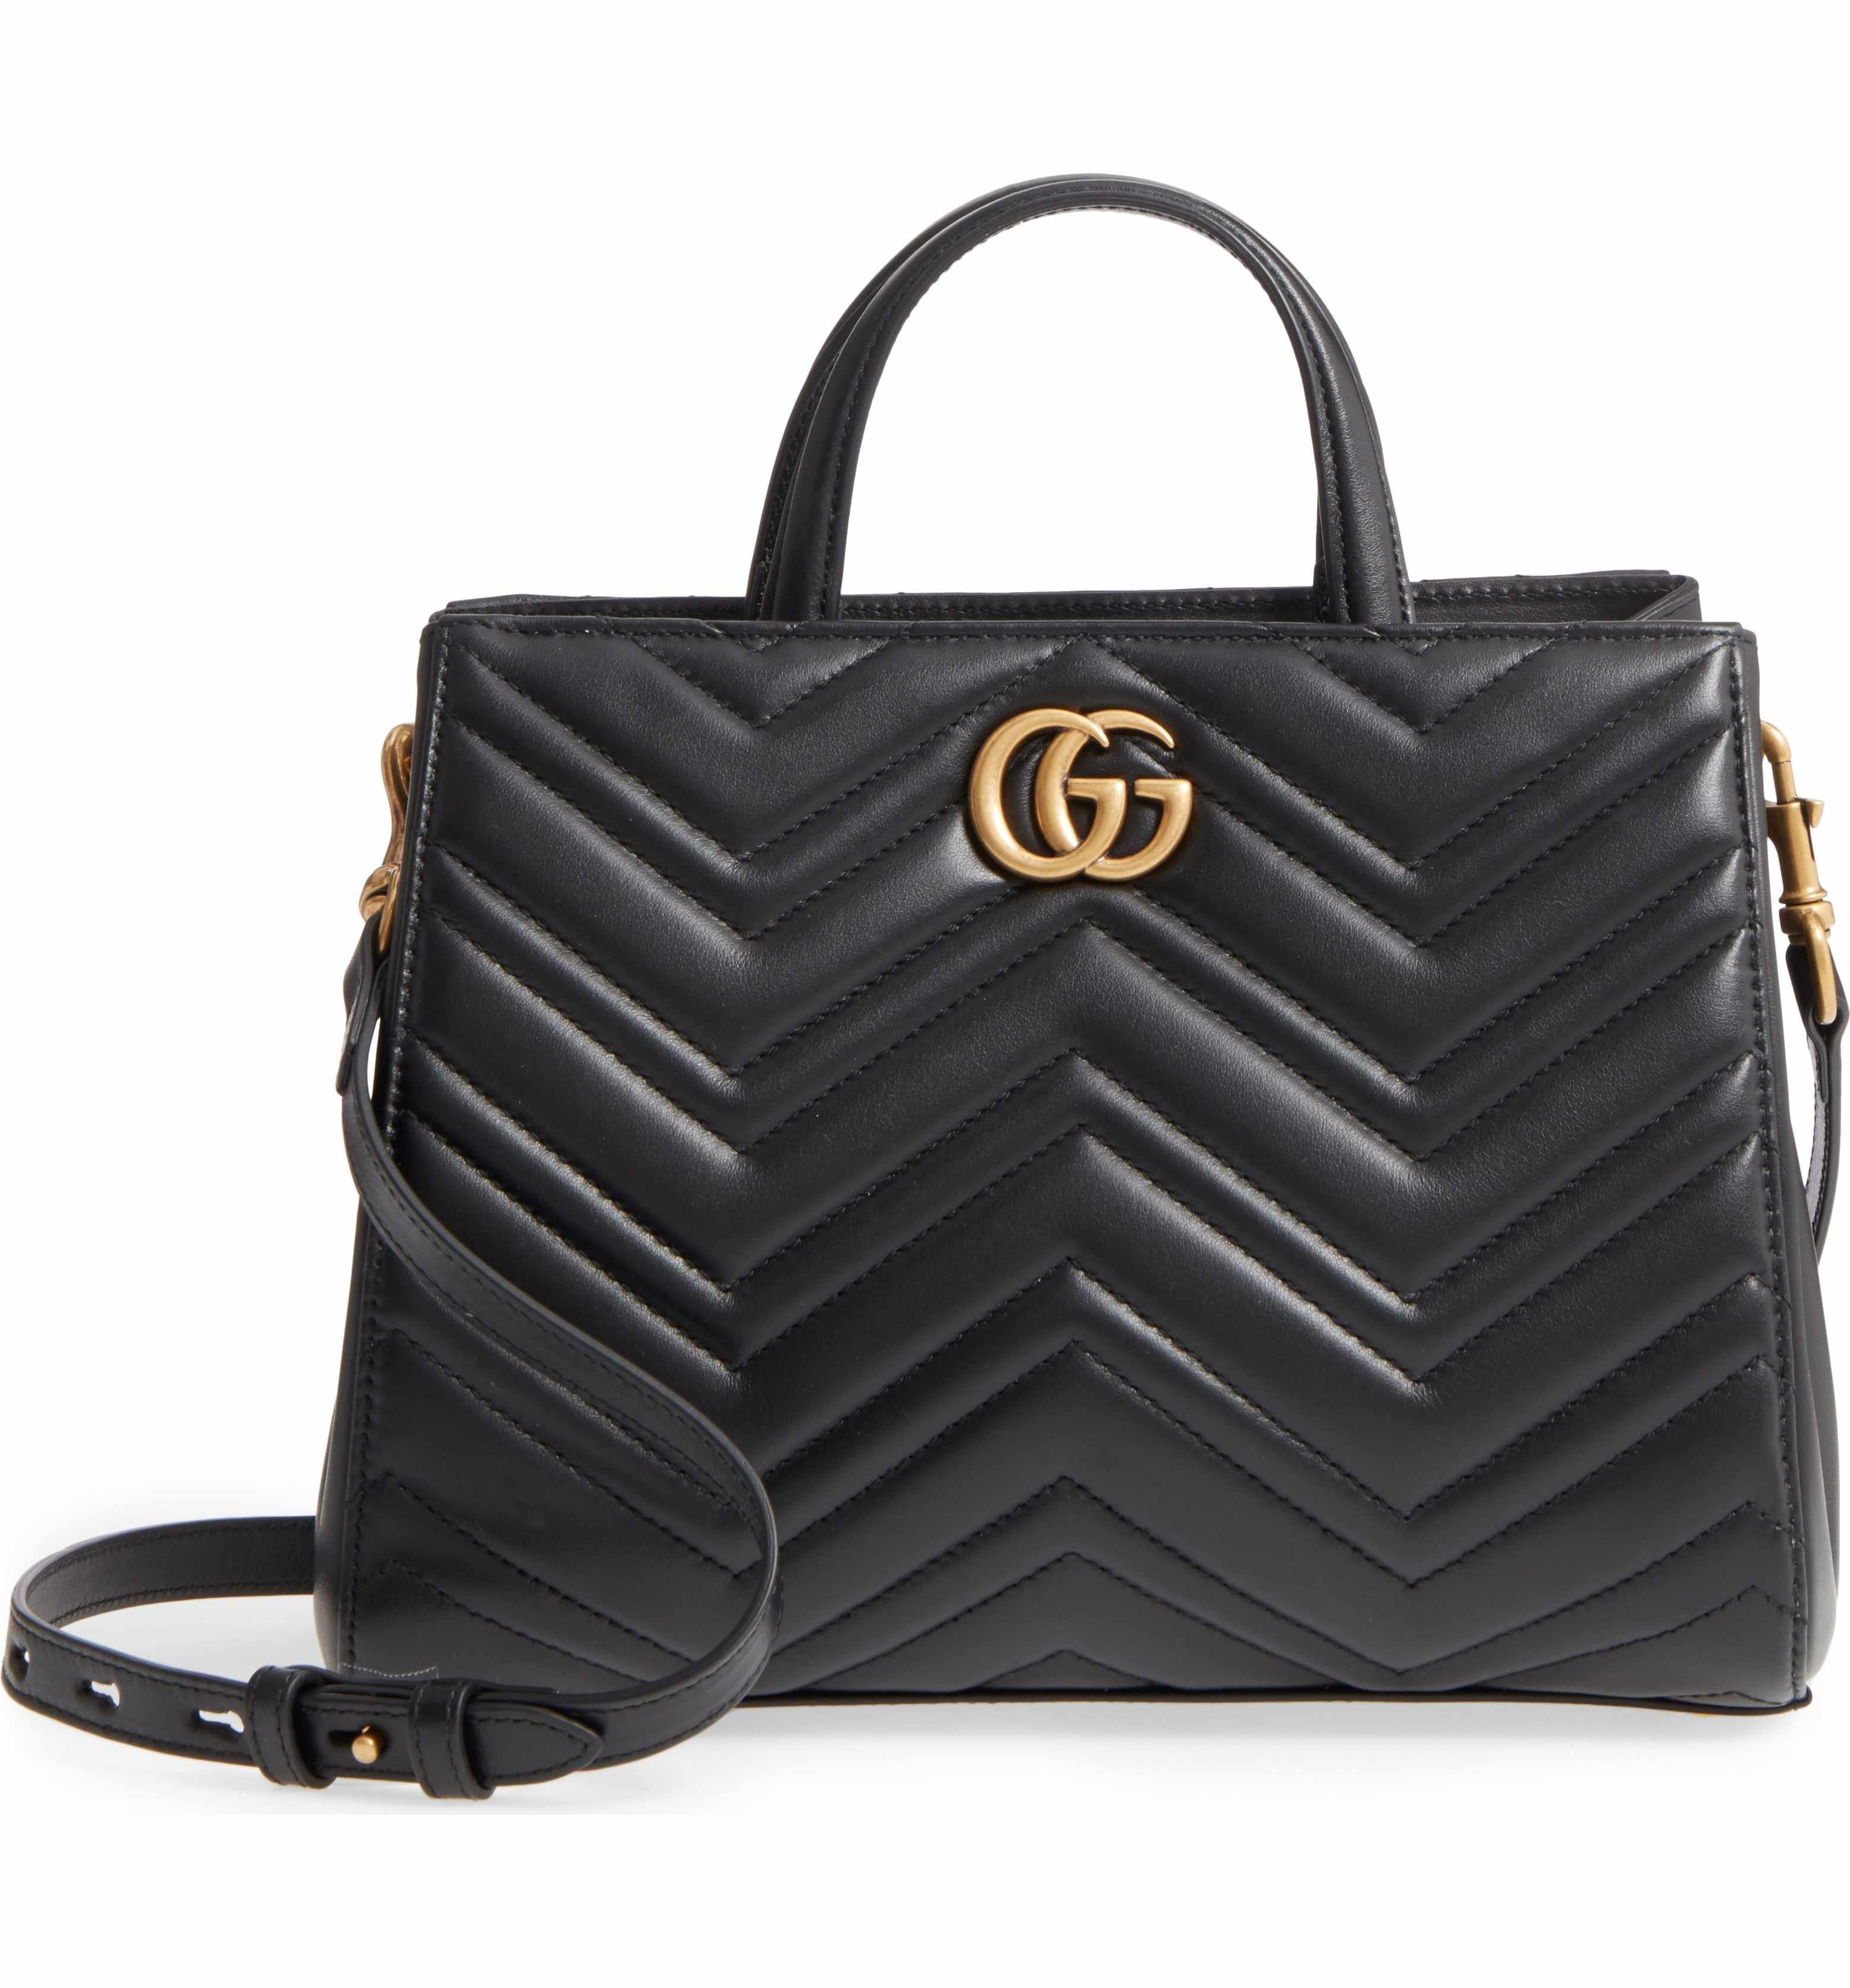 c59f7c401a4 Main Image - Gucci GG Small Marmont 2.0 Matelassé Leather Top Handle Satchel